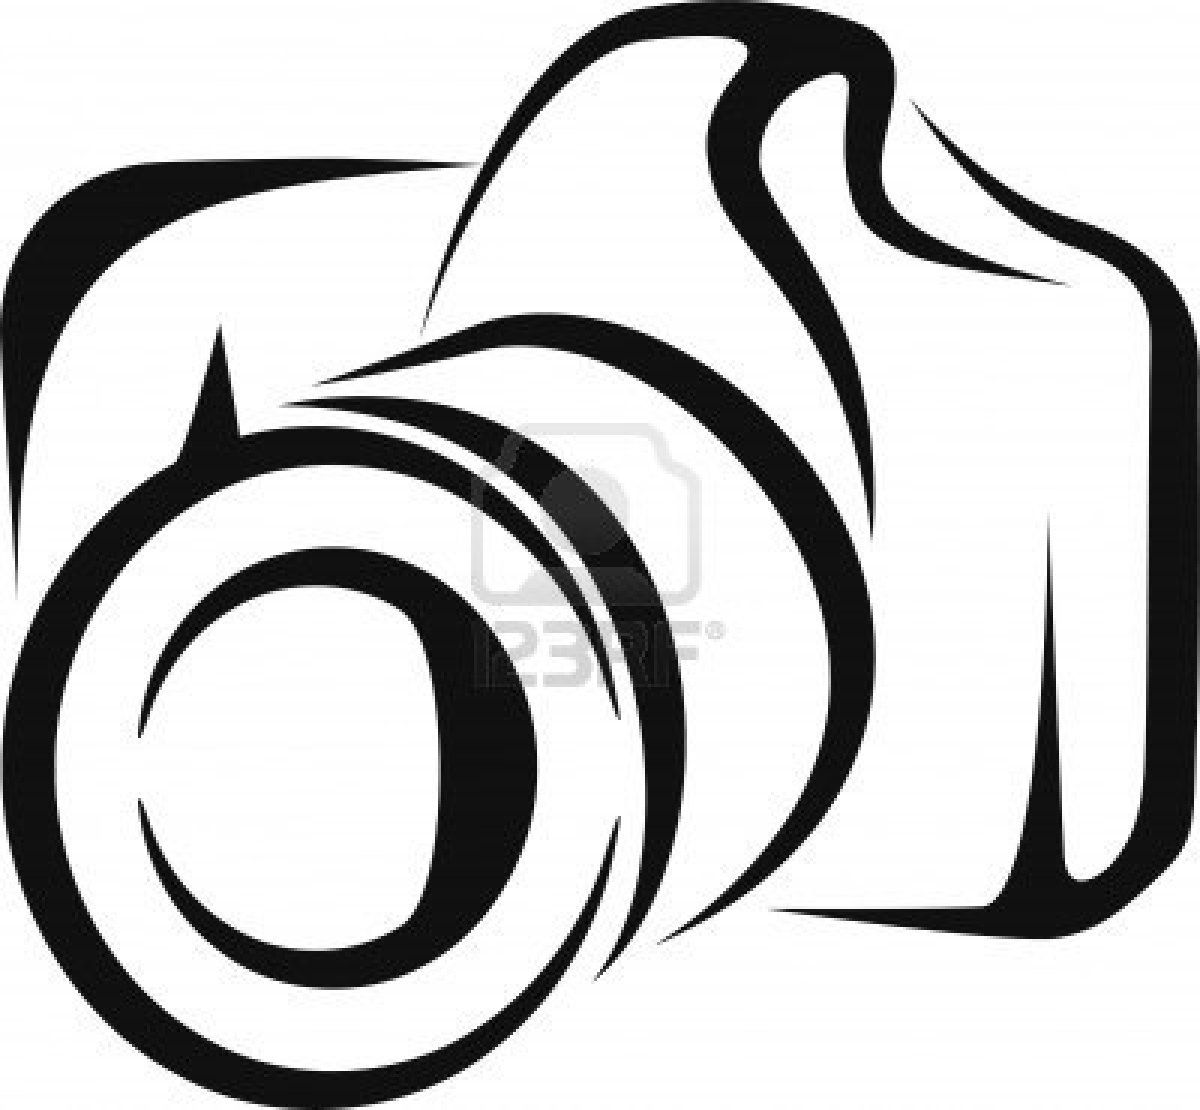 Camera Flash Animation Clipart Panda Free Clipart Images Camera Clip Art Free Clipart Images Animated Clipart